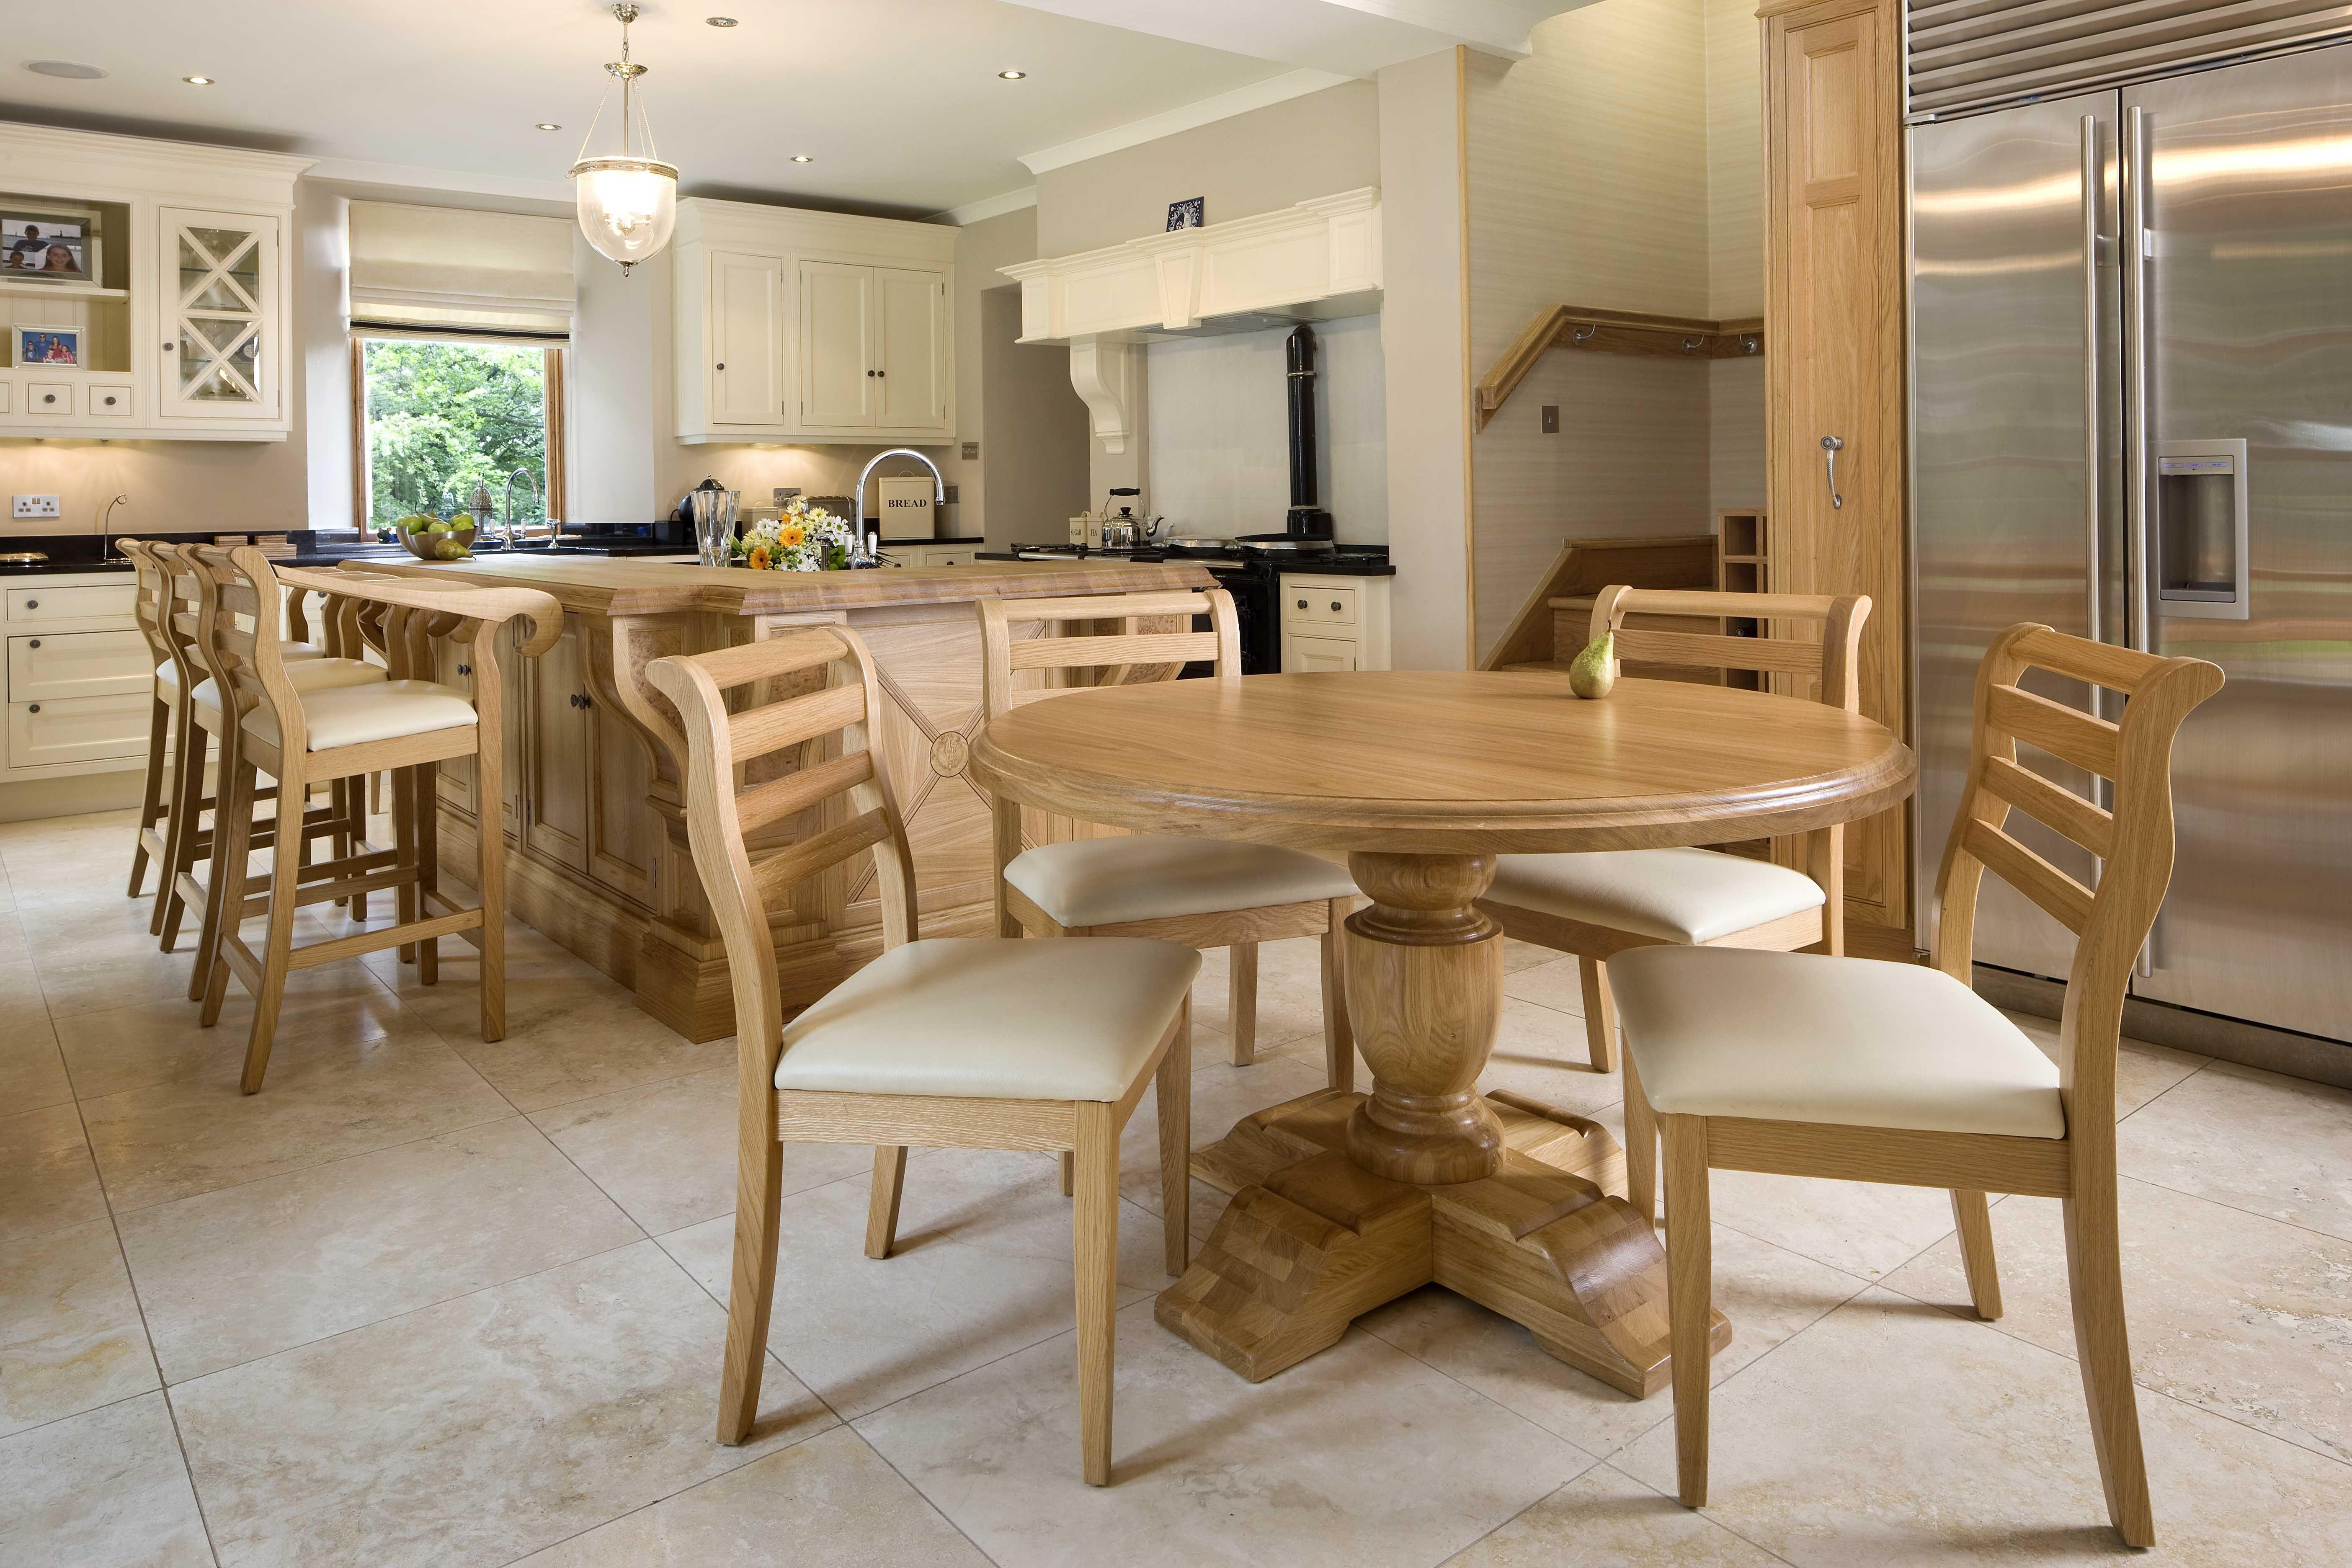 Awe Inspiring Bespoke Solid Oak Table To Match A Clive Christian Kitchen Creativecarmelina Interior Chair Design Creativecarmelinacom